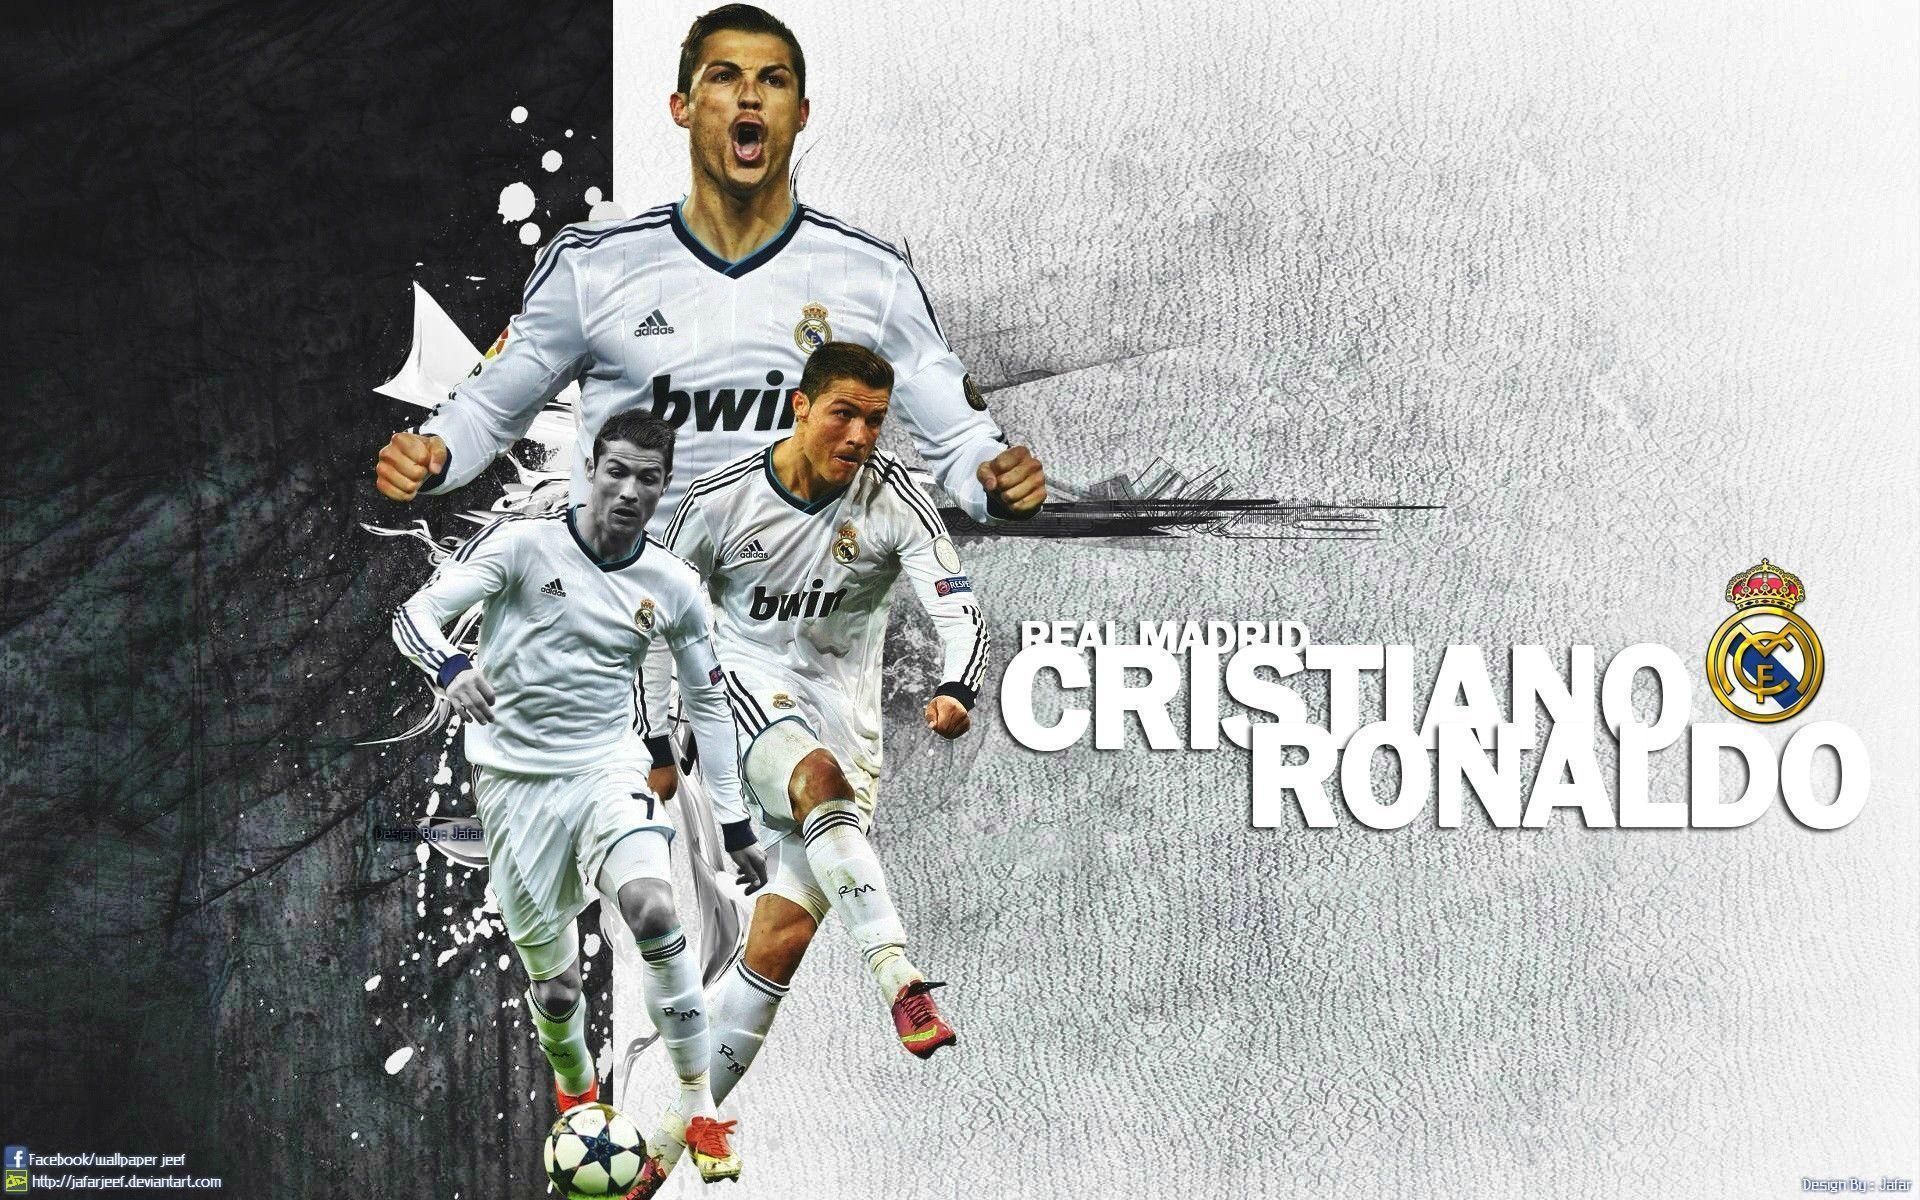 Fonds d'écran Cristiano Ronaldo : tous les wallpapers Cristiano .